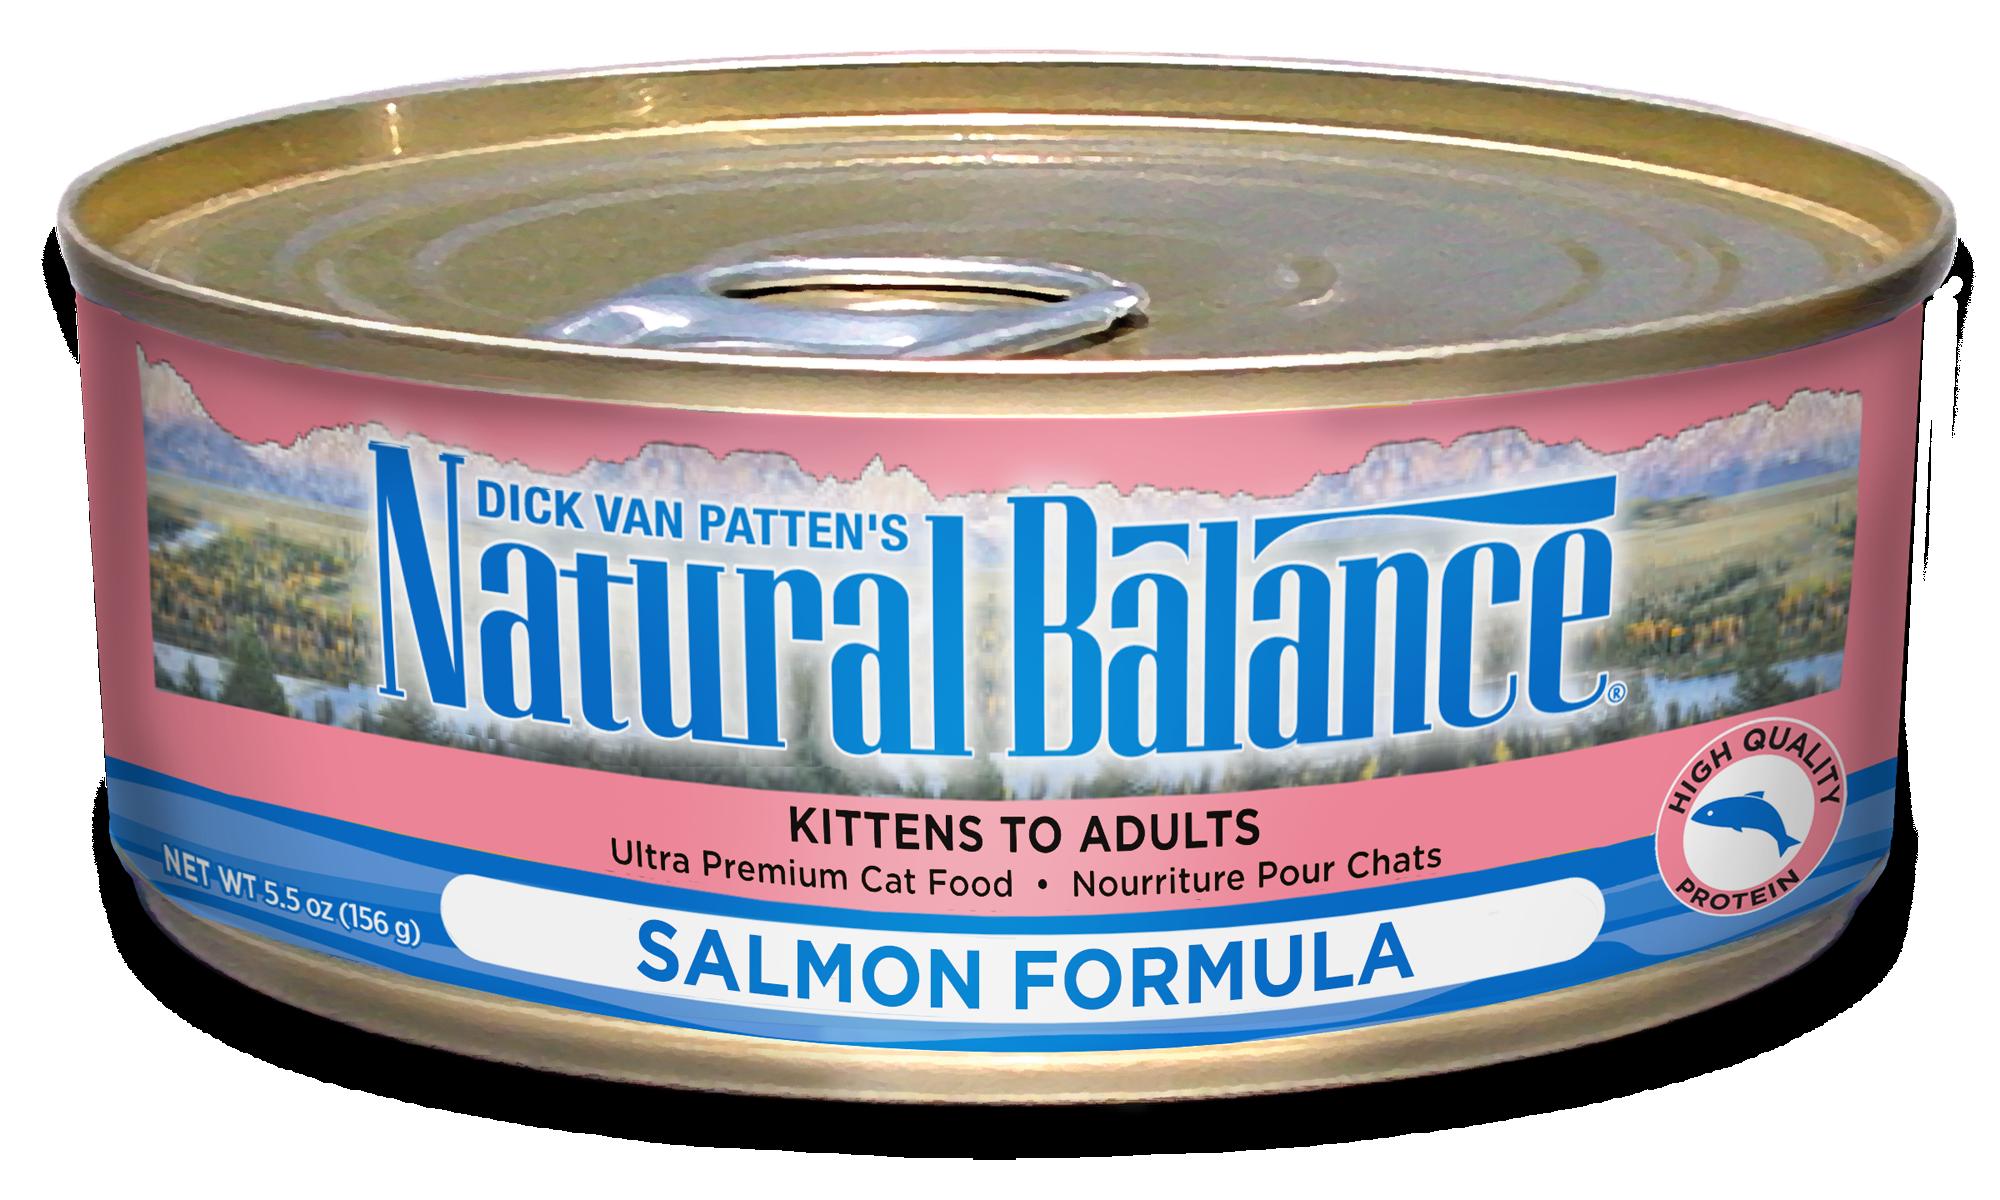 Natural Balance Salmon Formula Wet Cat Food, 5.5 oz., Case